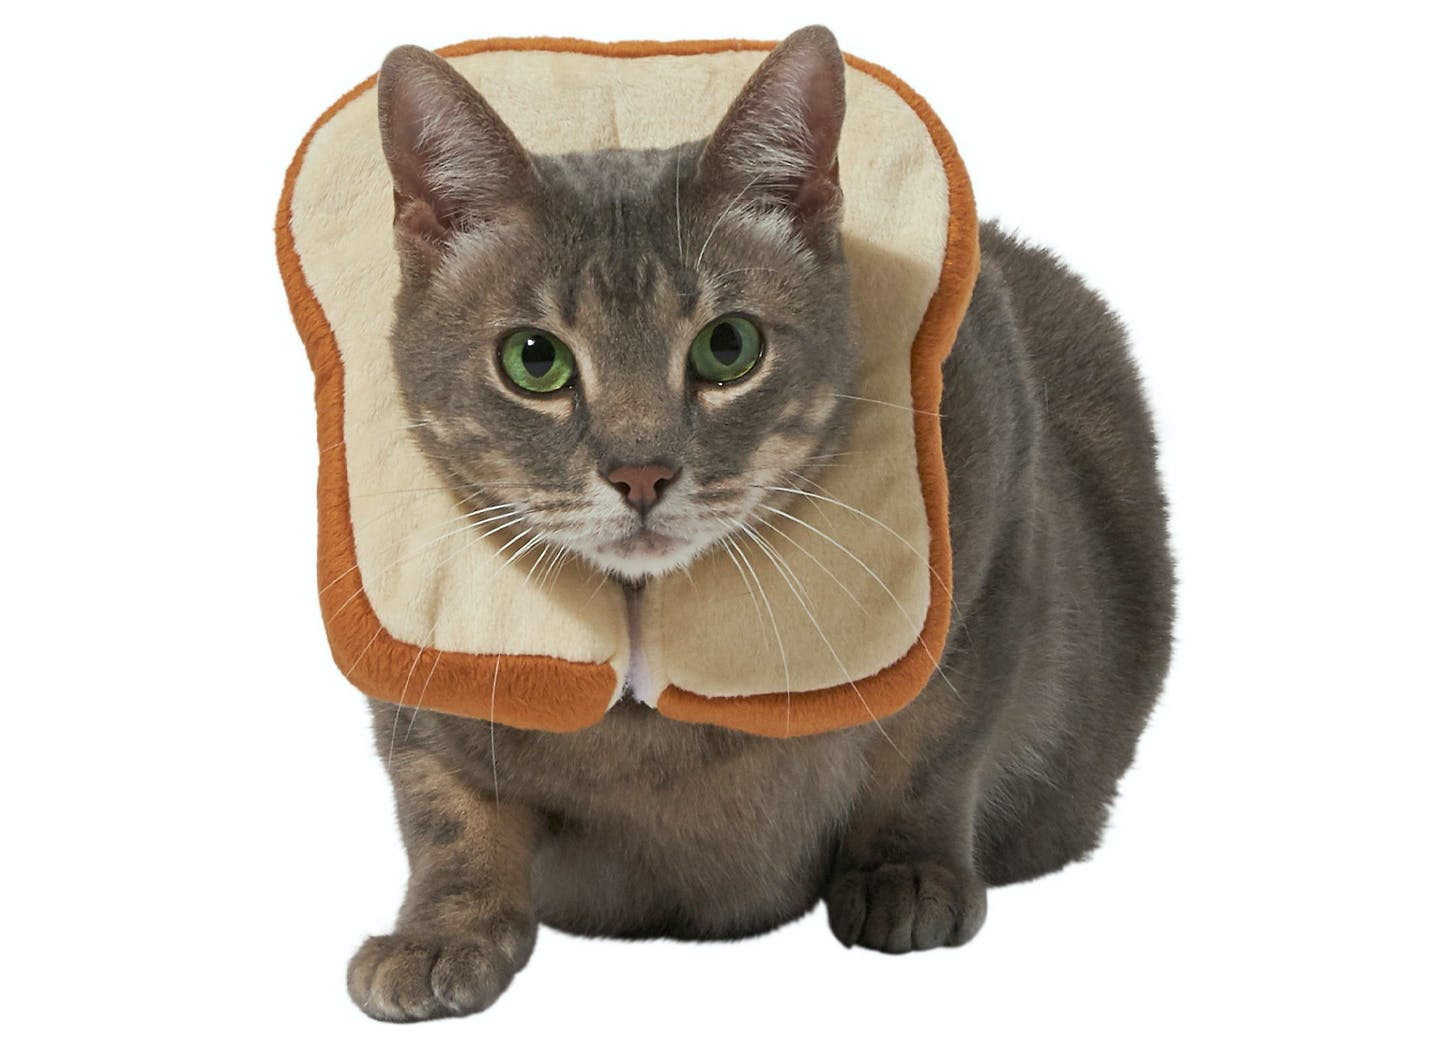 bread face cat halloween costumes